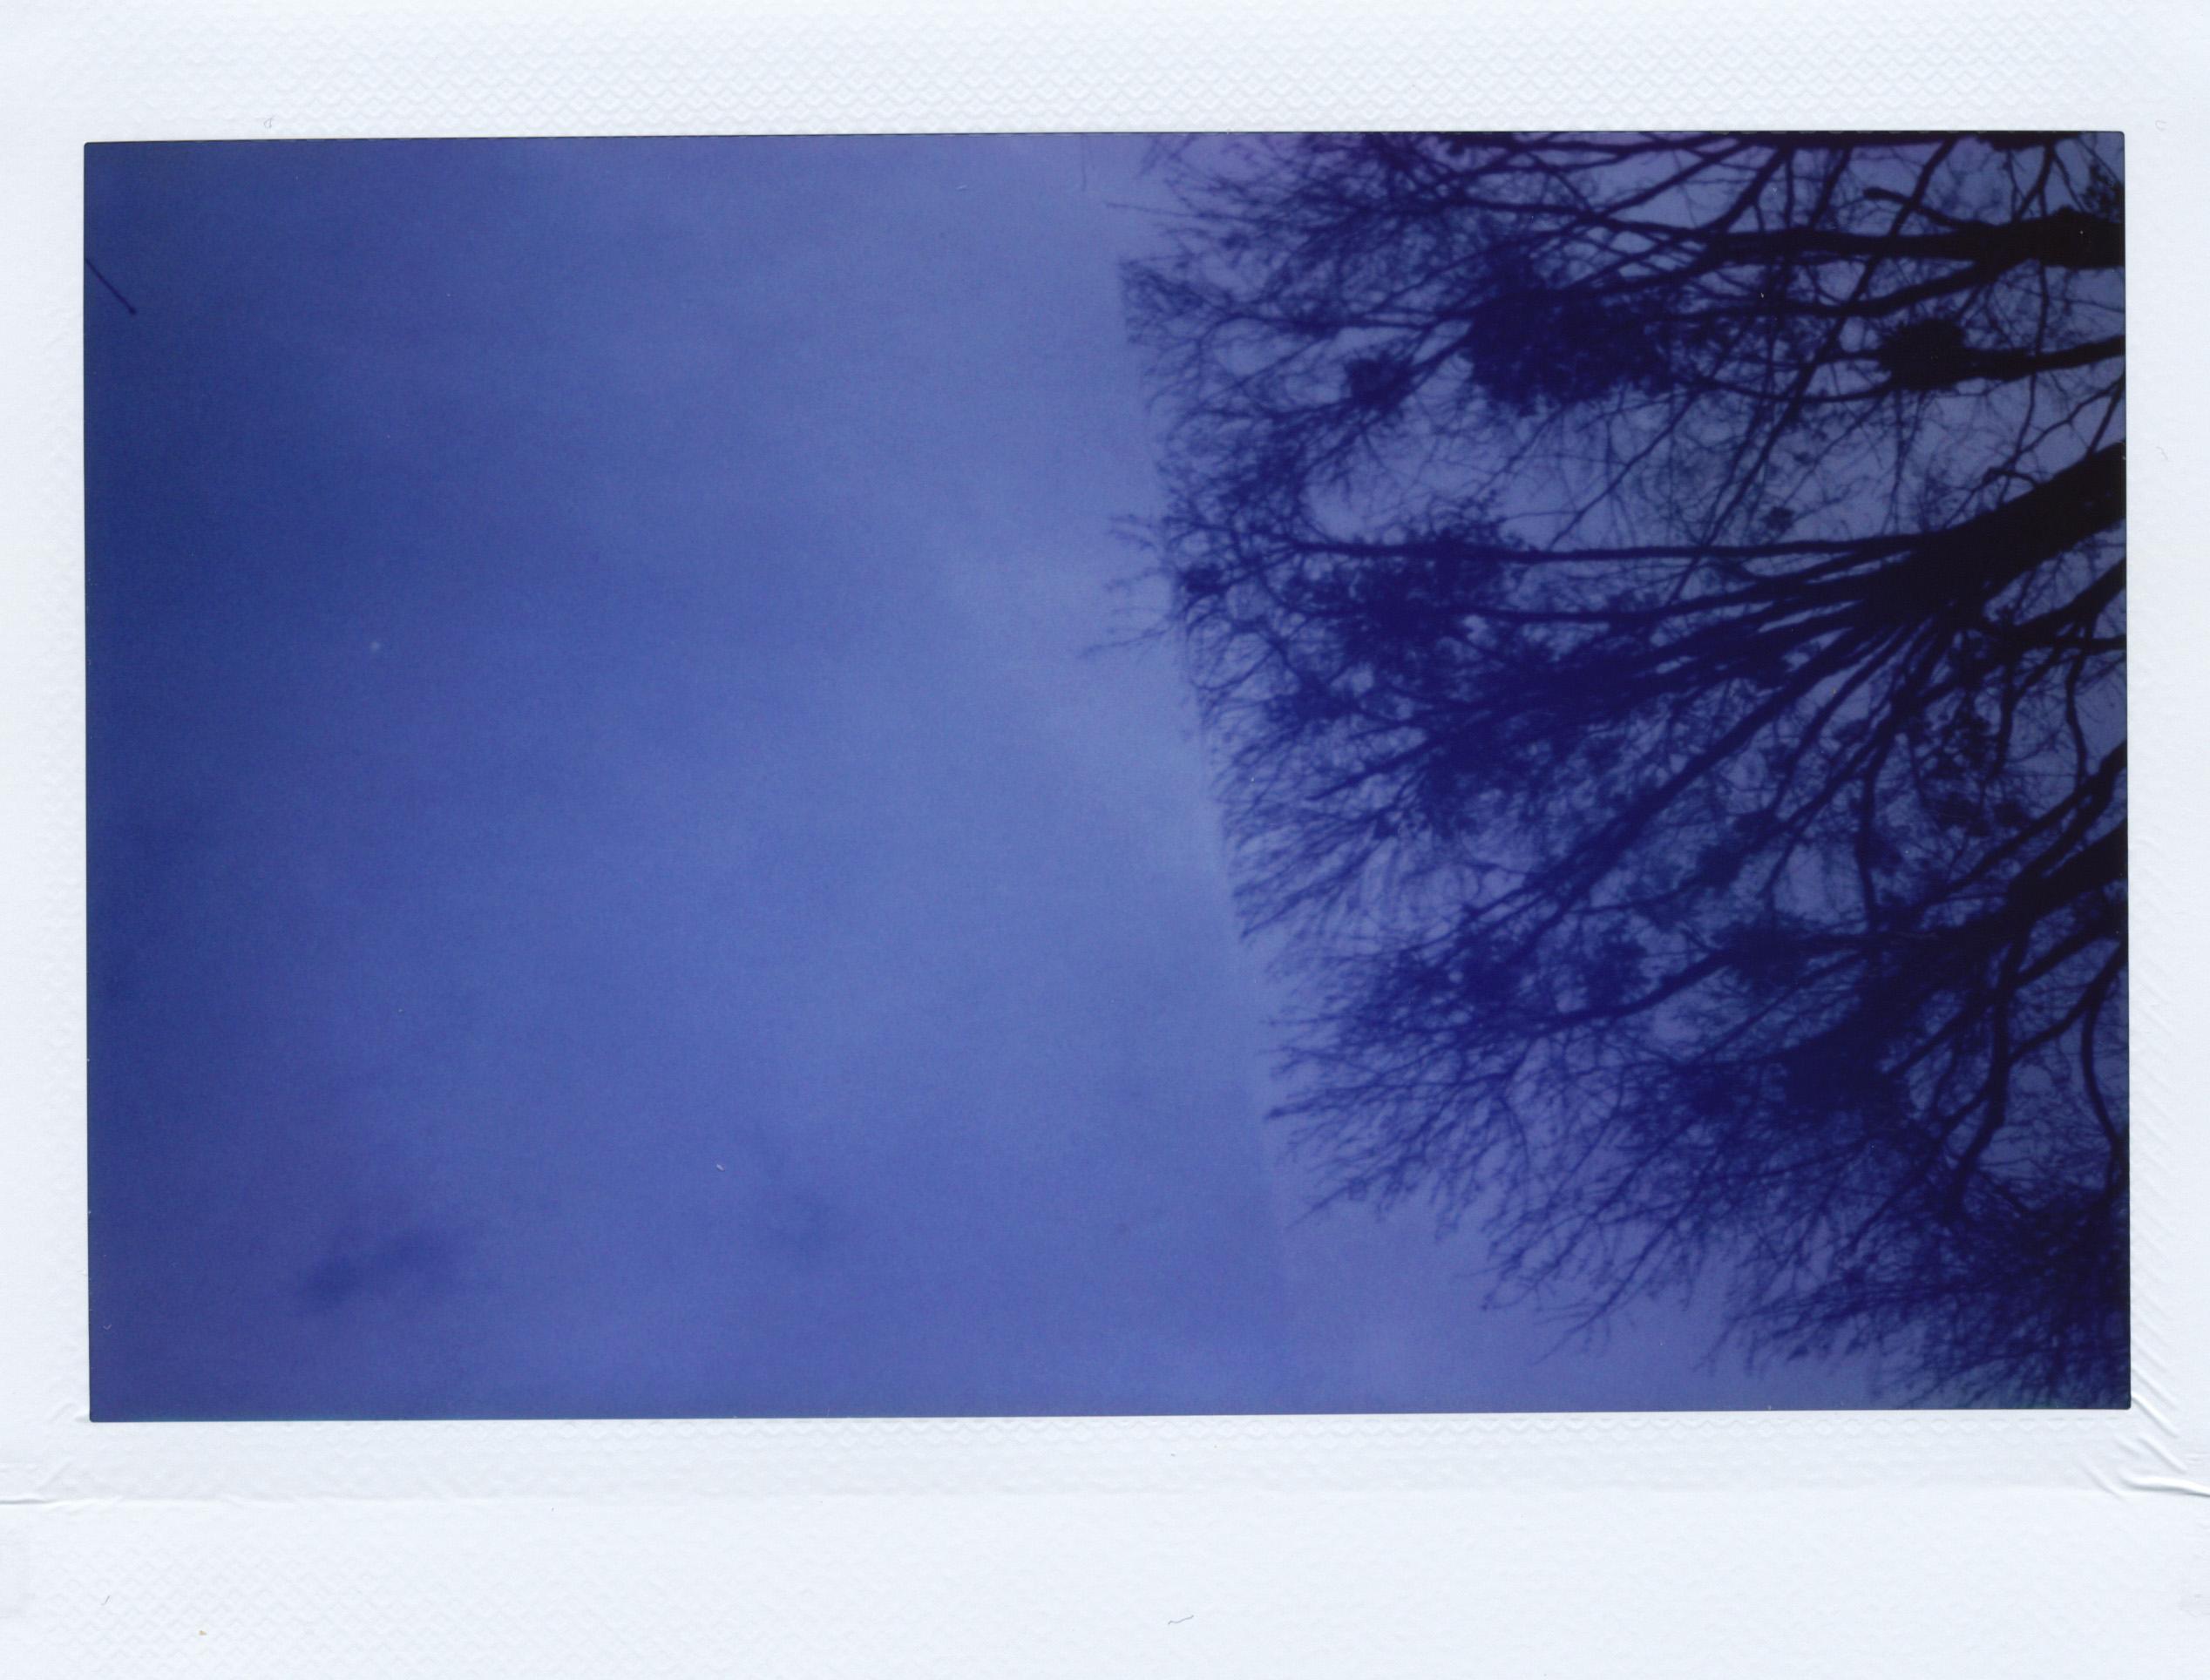 Fotos gratis : azul, sábado, bosquejo, dibujo, texto, marco ...